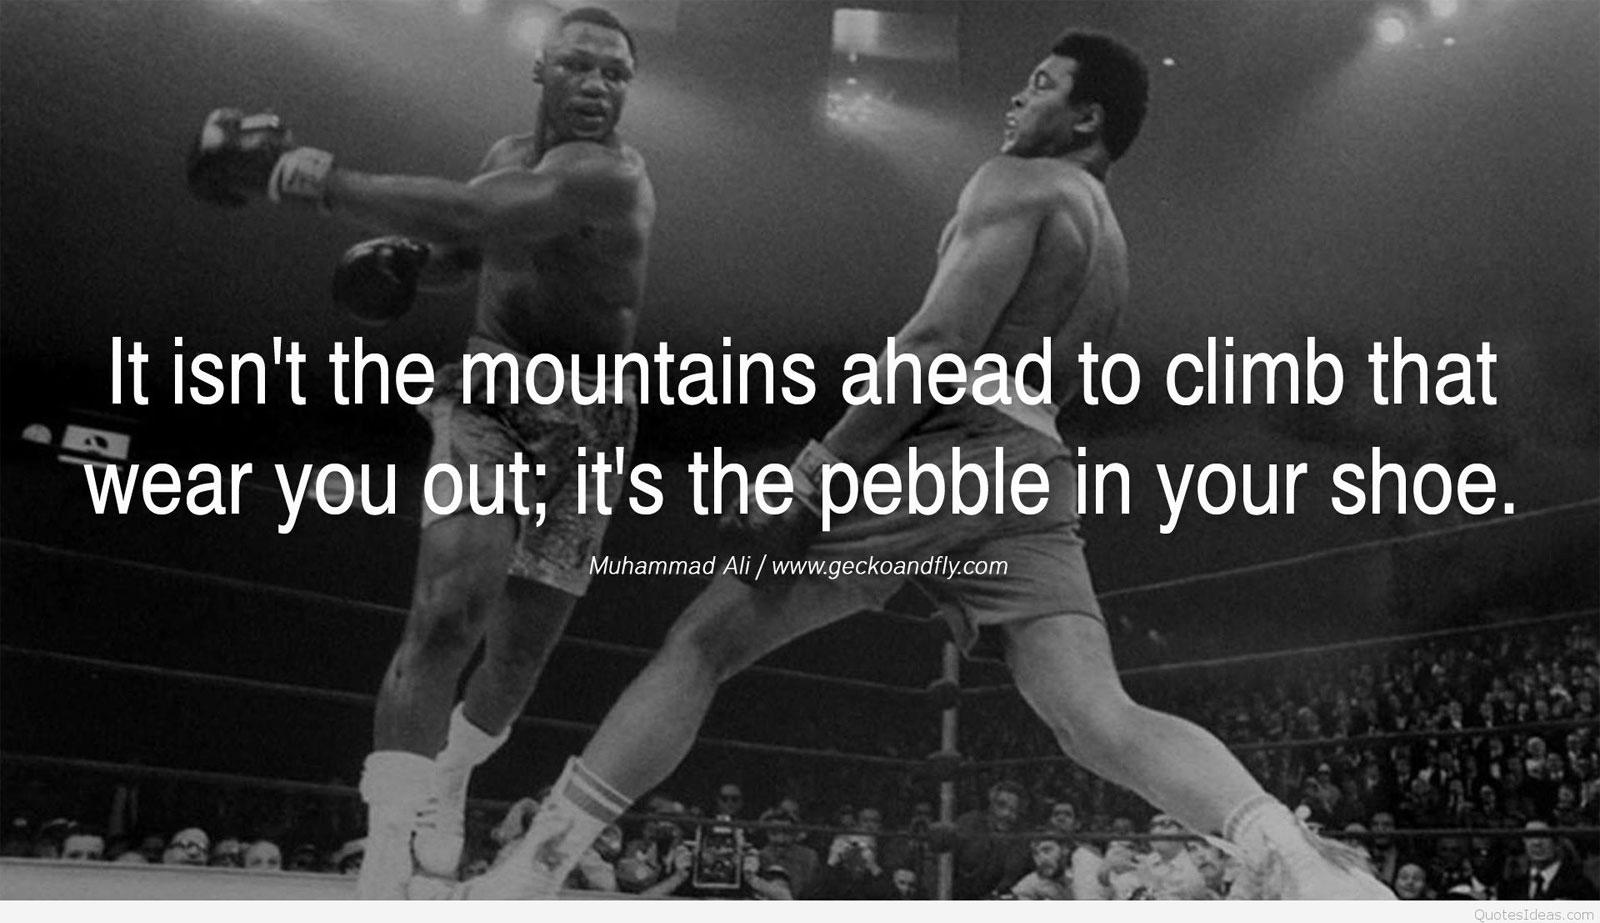 inspirational quotes hd wallpaper